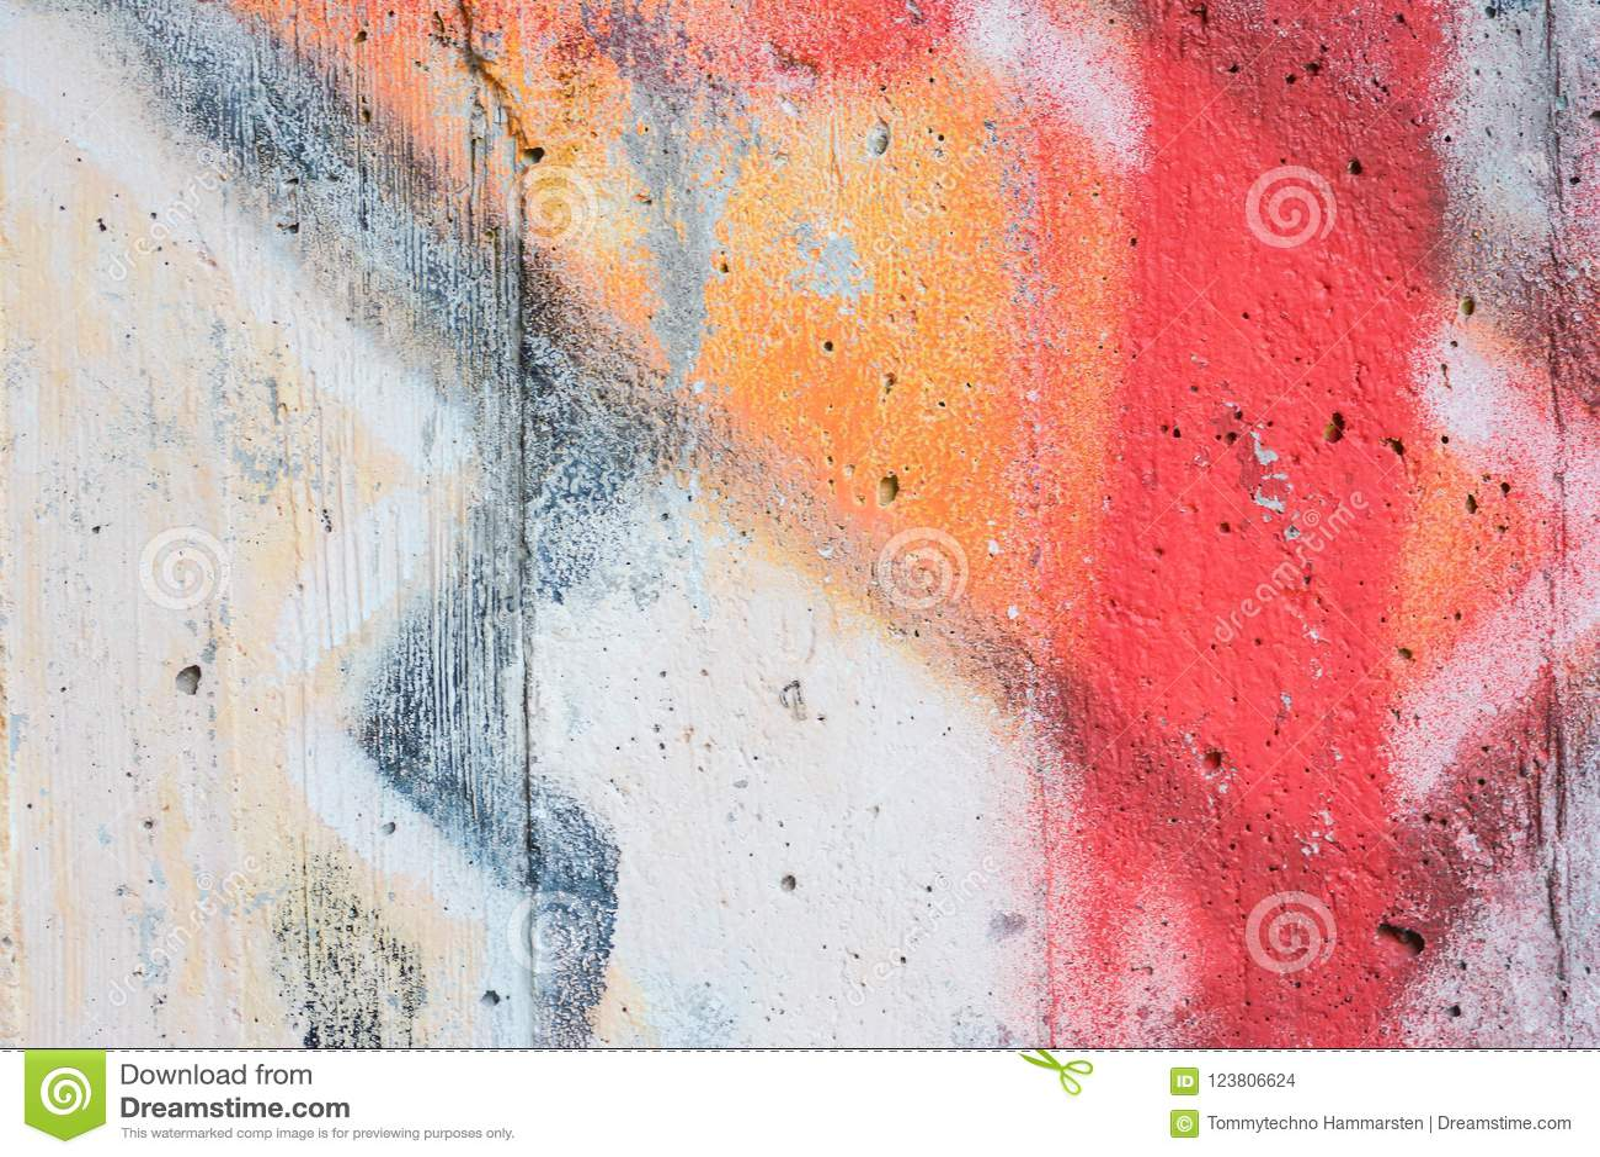 Grafiti Background On The Concrete Wall Stock Photo Image